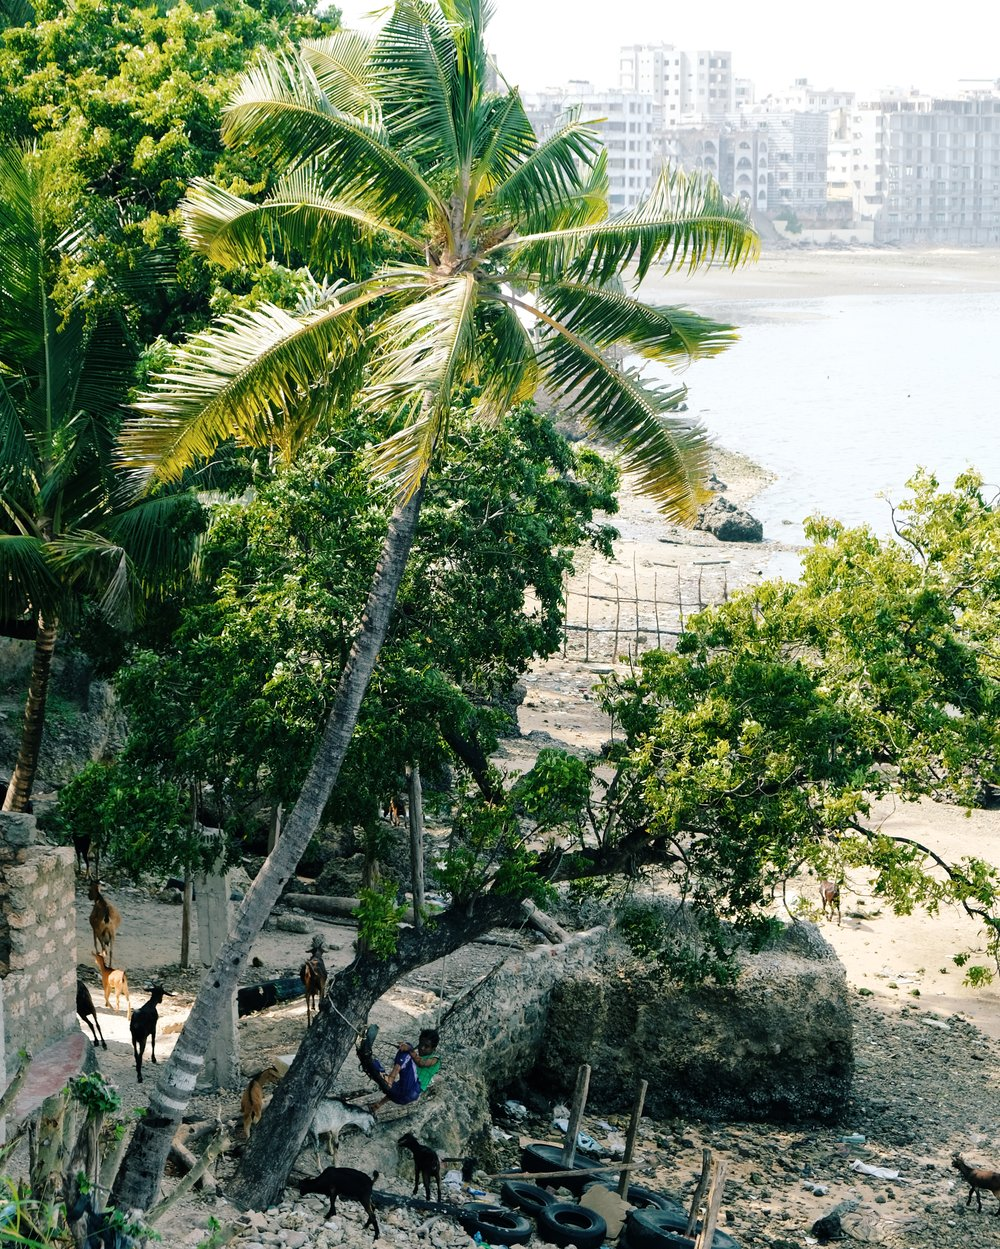 Mombasa by Joost Bastmeijer.jpeg